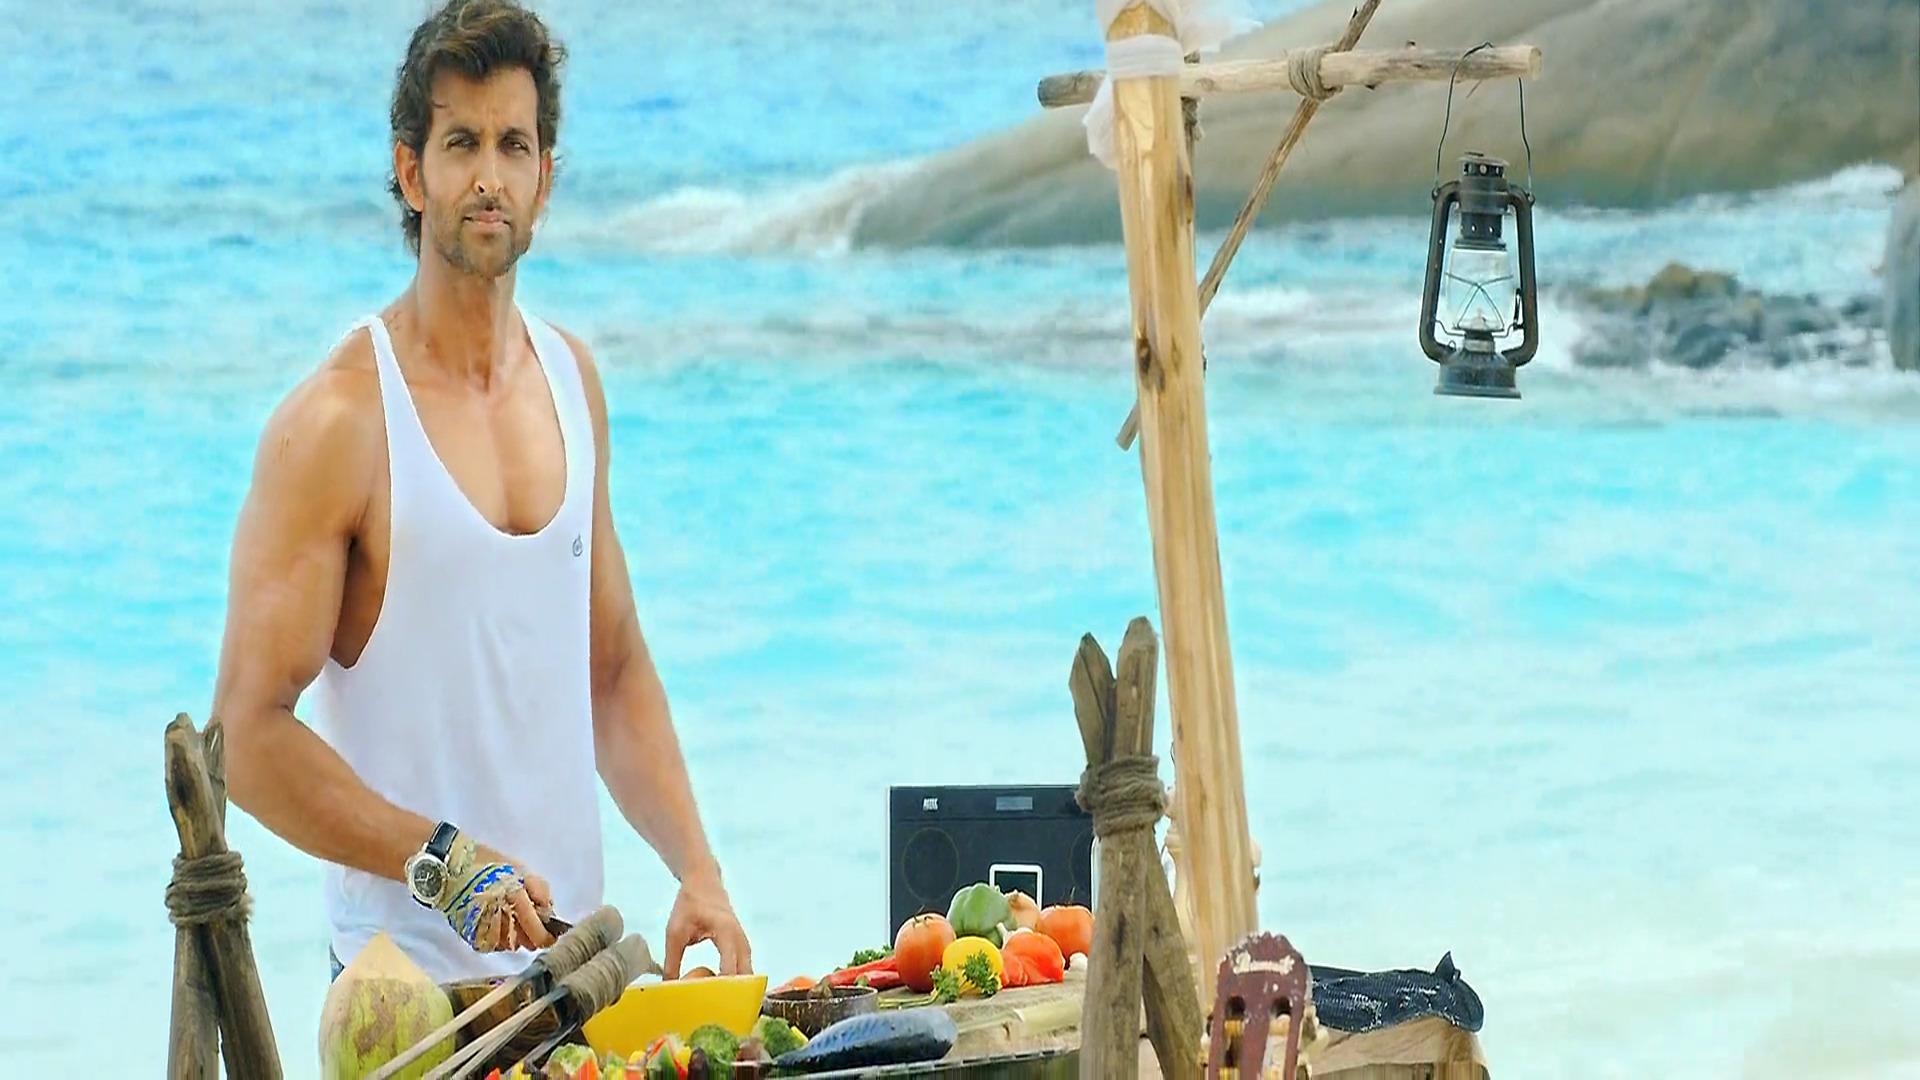 Hindi movie actor hrithik roshan image hd wallpapers - Hrithik roshan image download ...